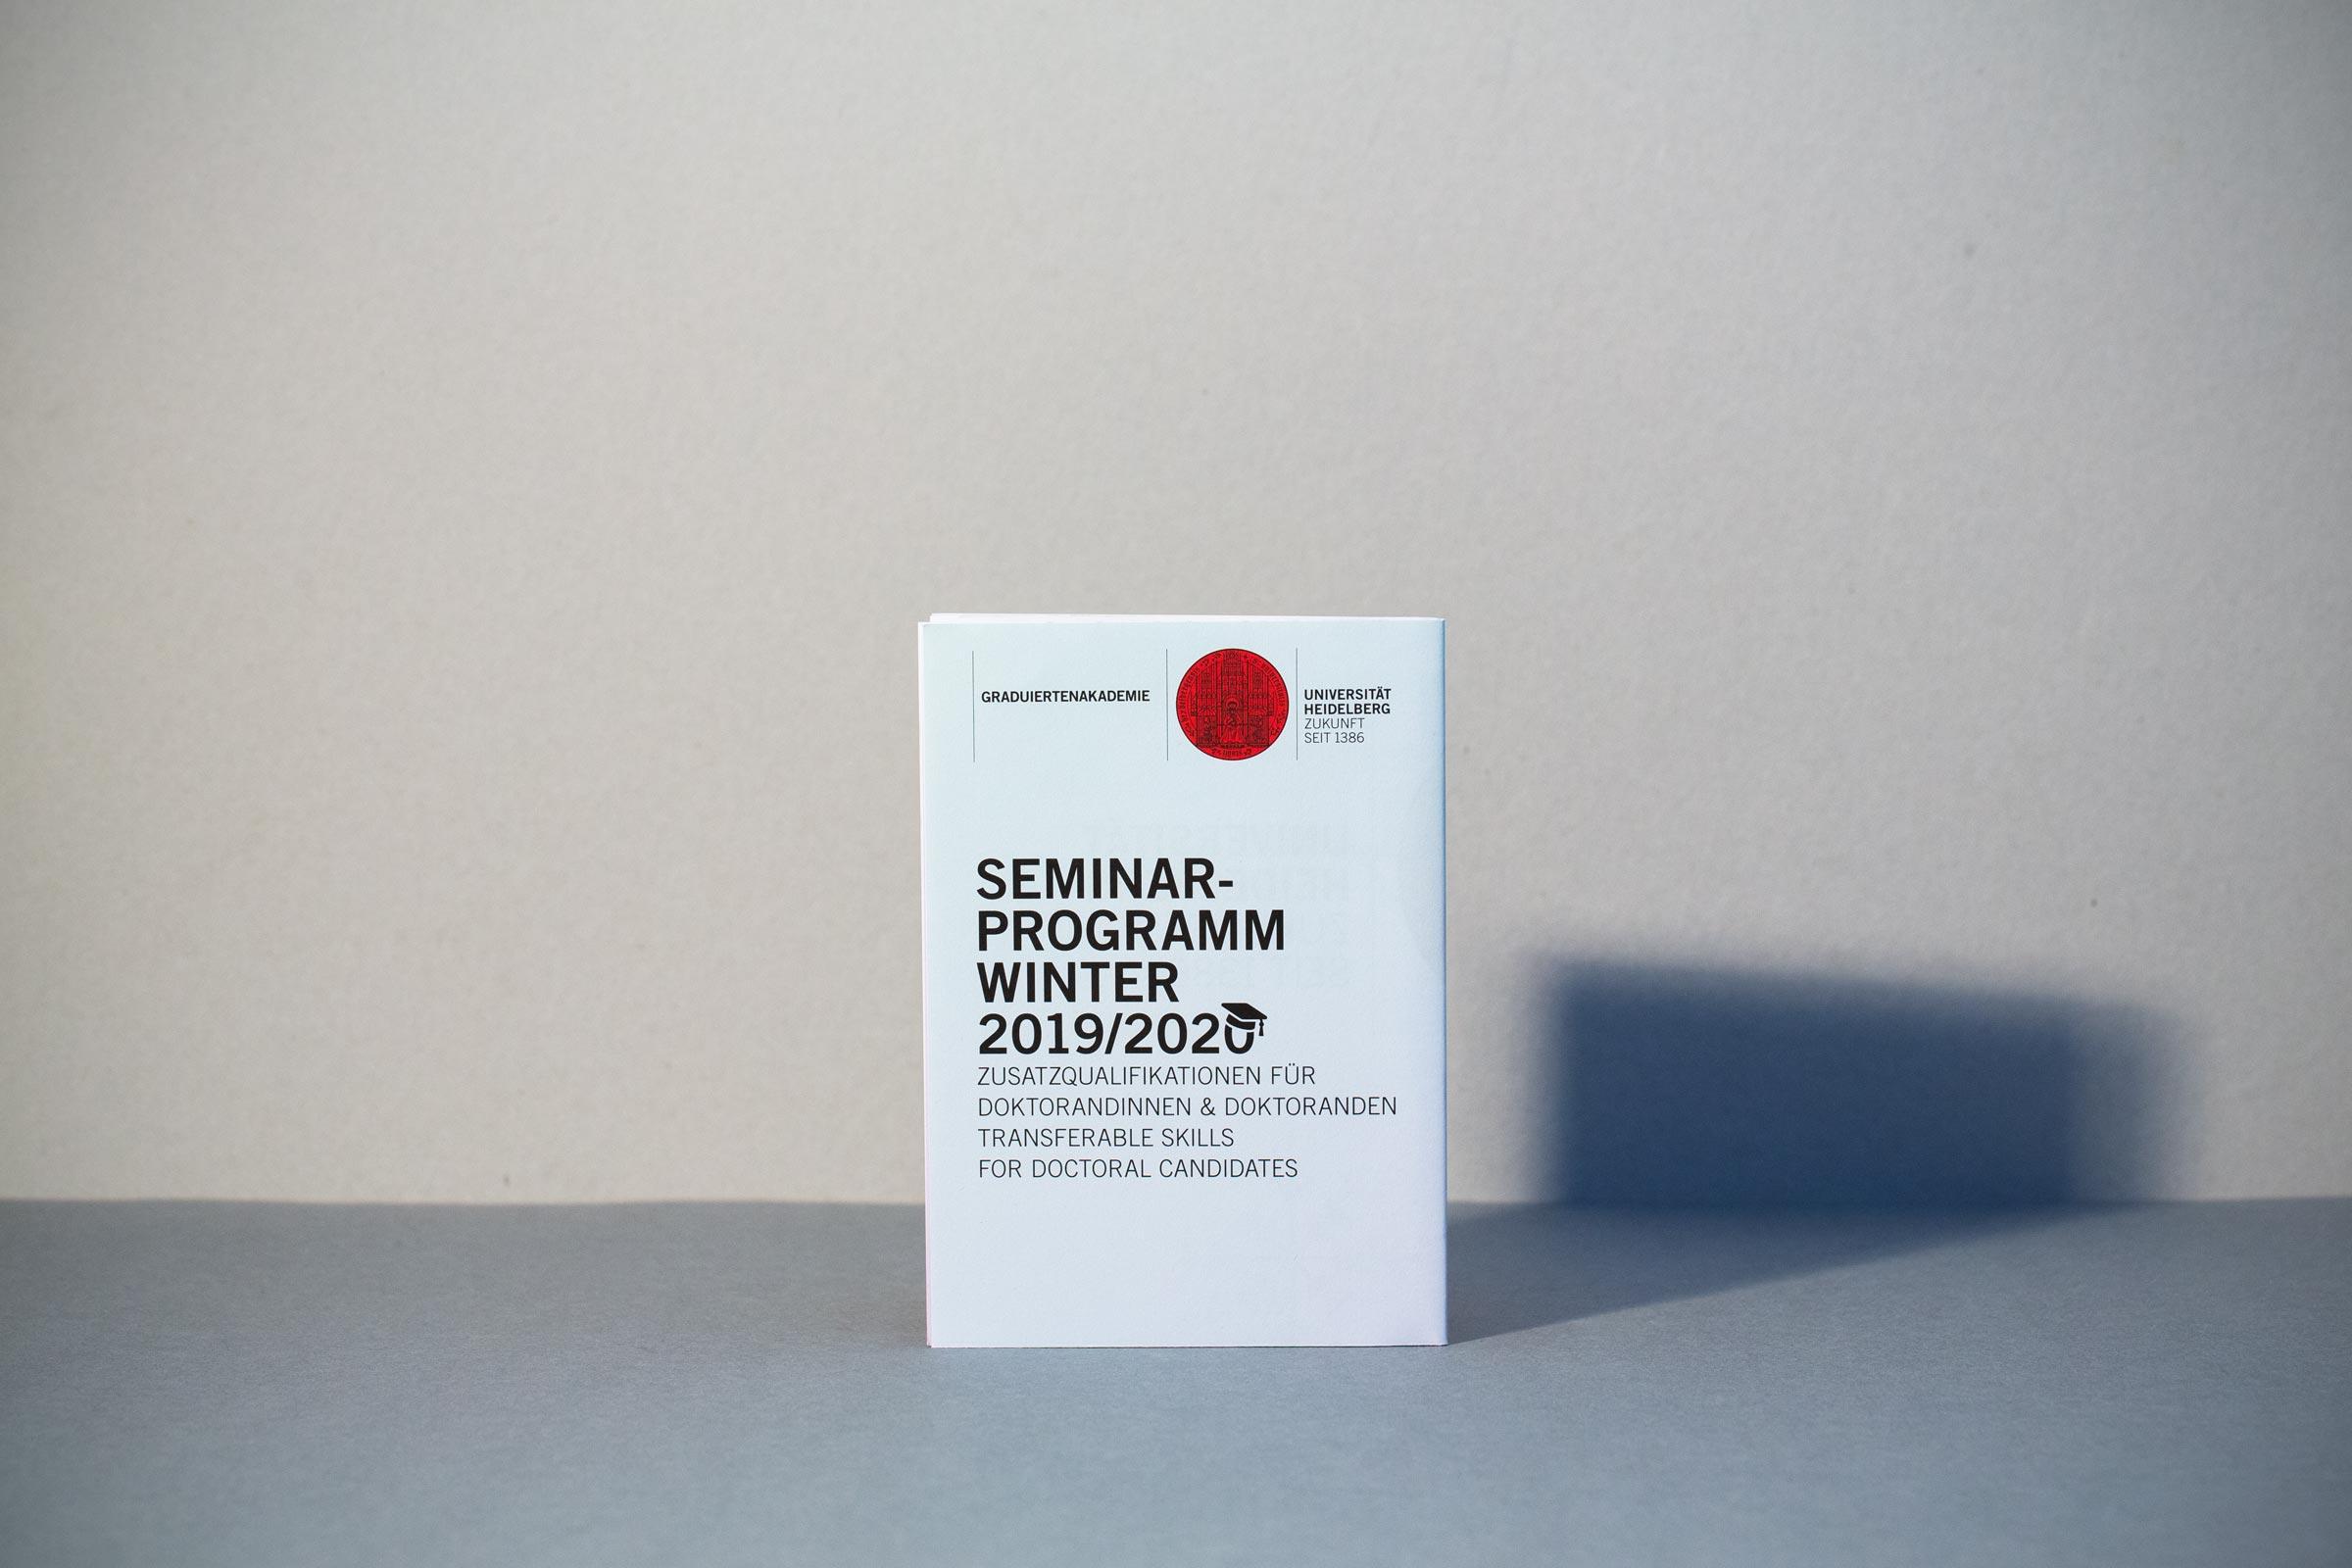 Gesa Siebert Kommunikationsdesign Graduiertenakademie Universität Heidelberg Flyer Faltflyer Plakat Illustration Seminarprogramm Wintersemester 2019/2020 Vorderseite